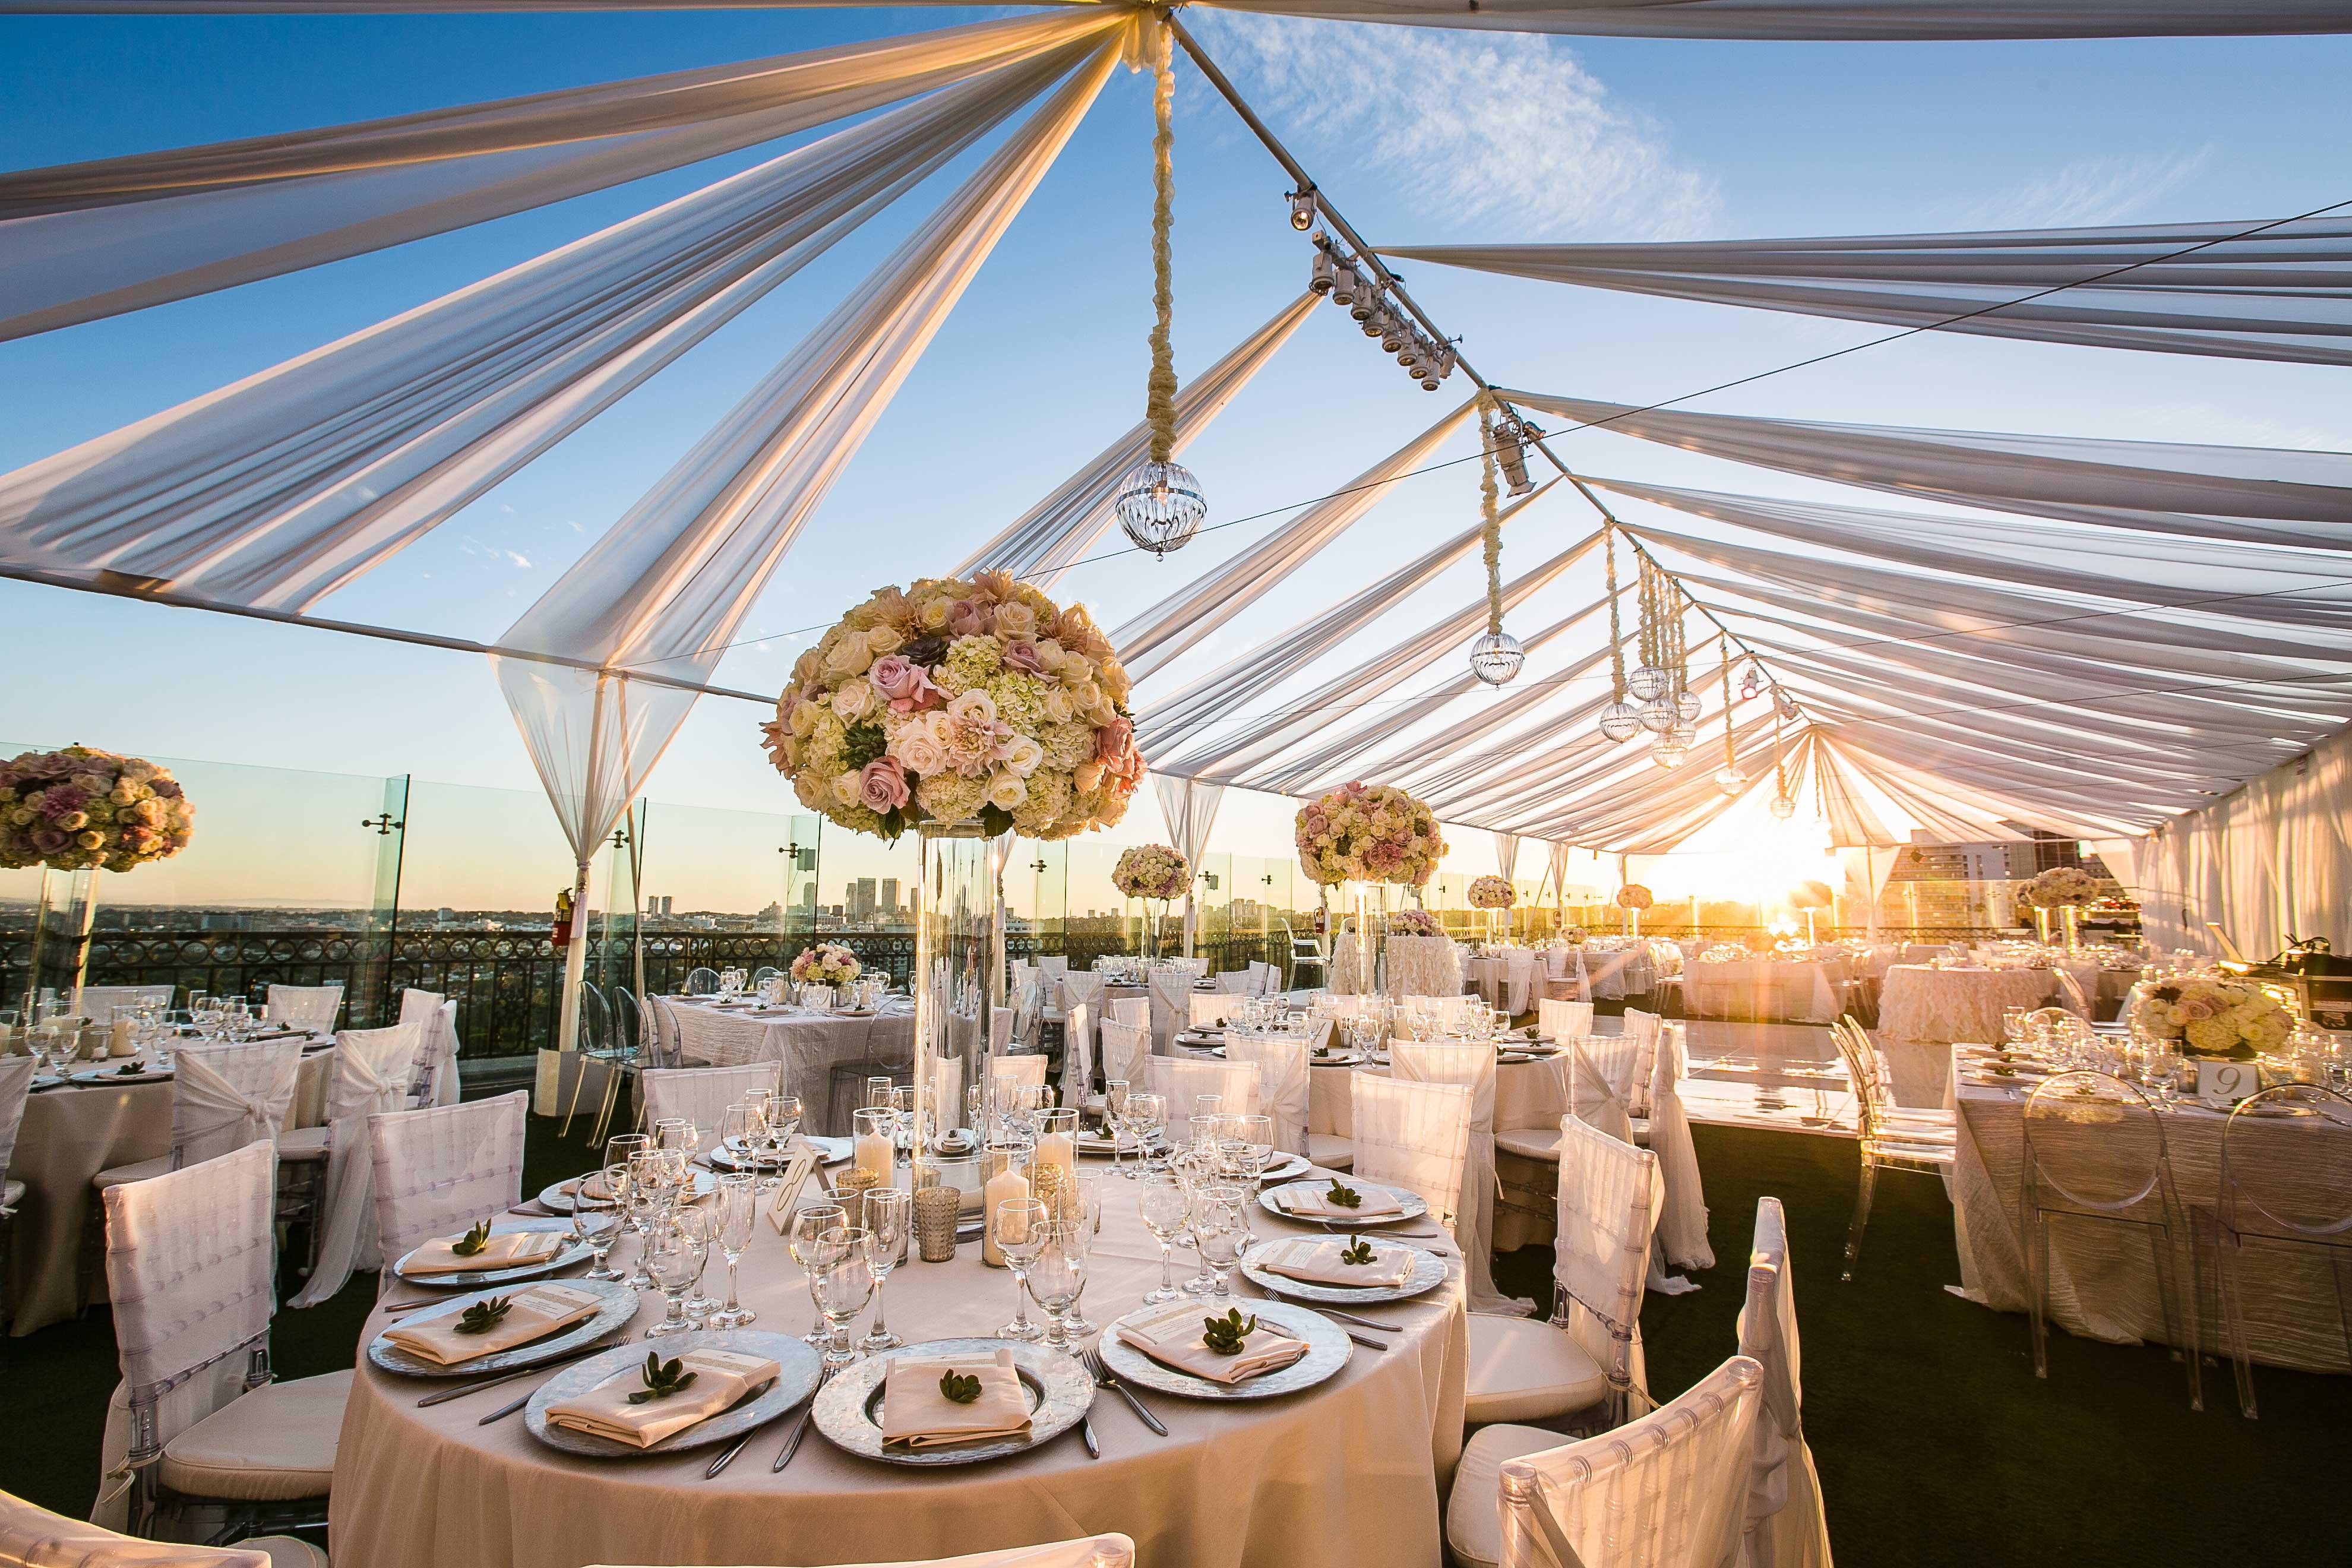 open-air reception, tent wedding reception, alfresco, outdoor